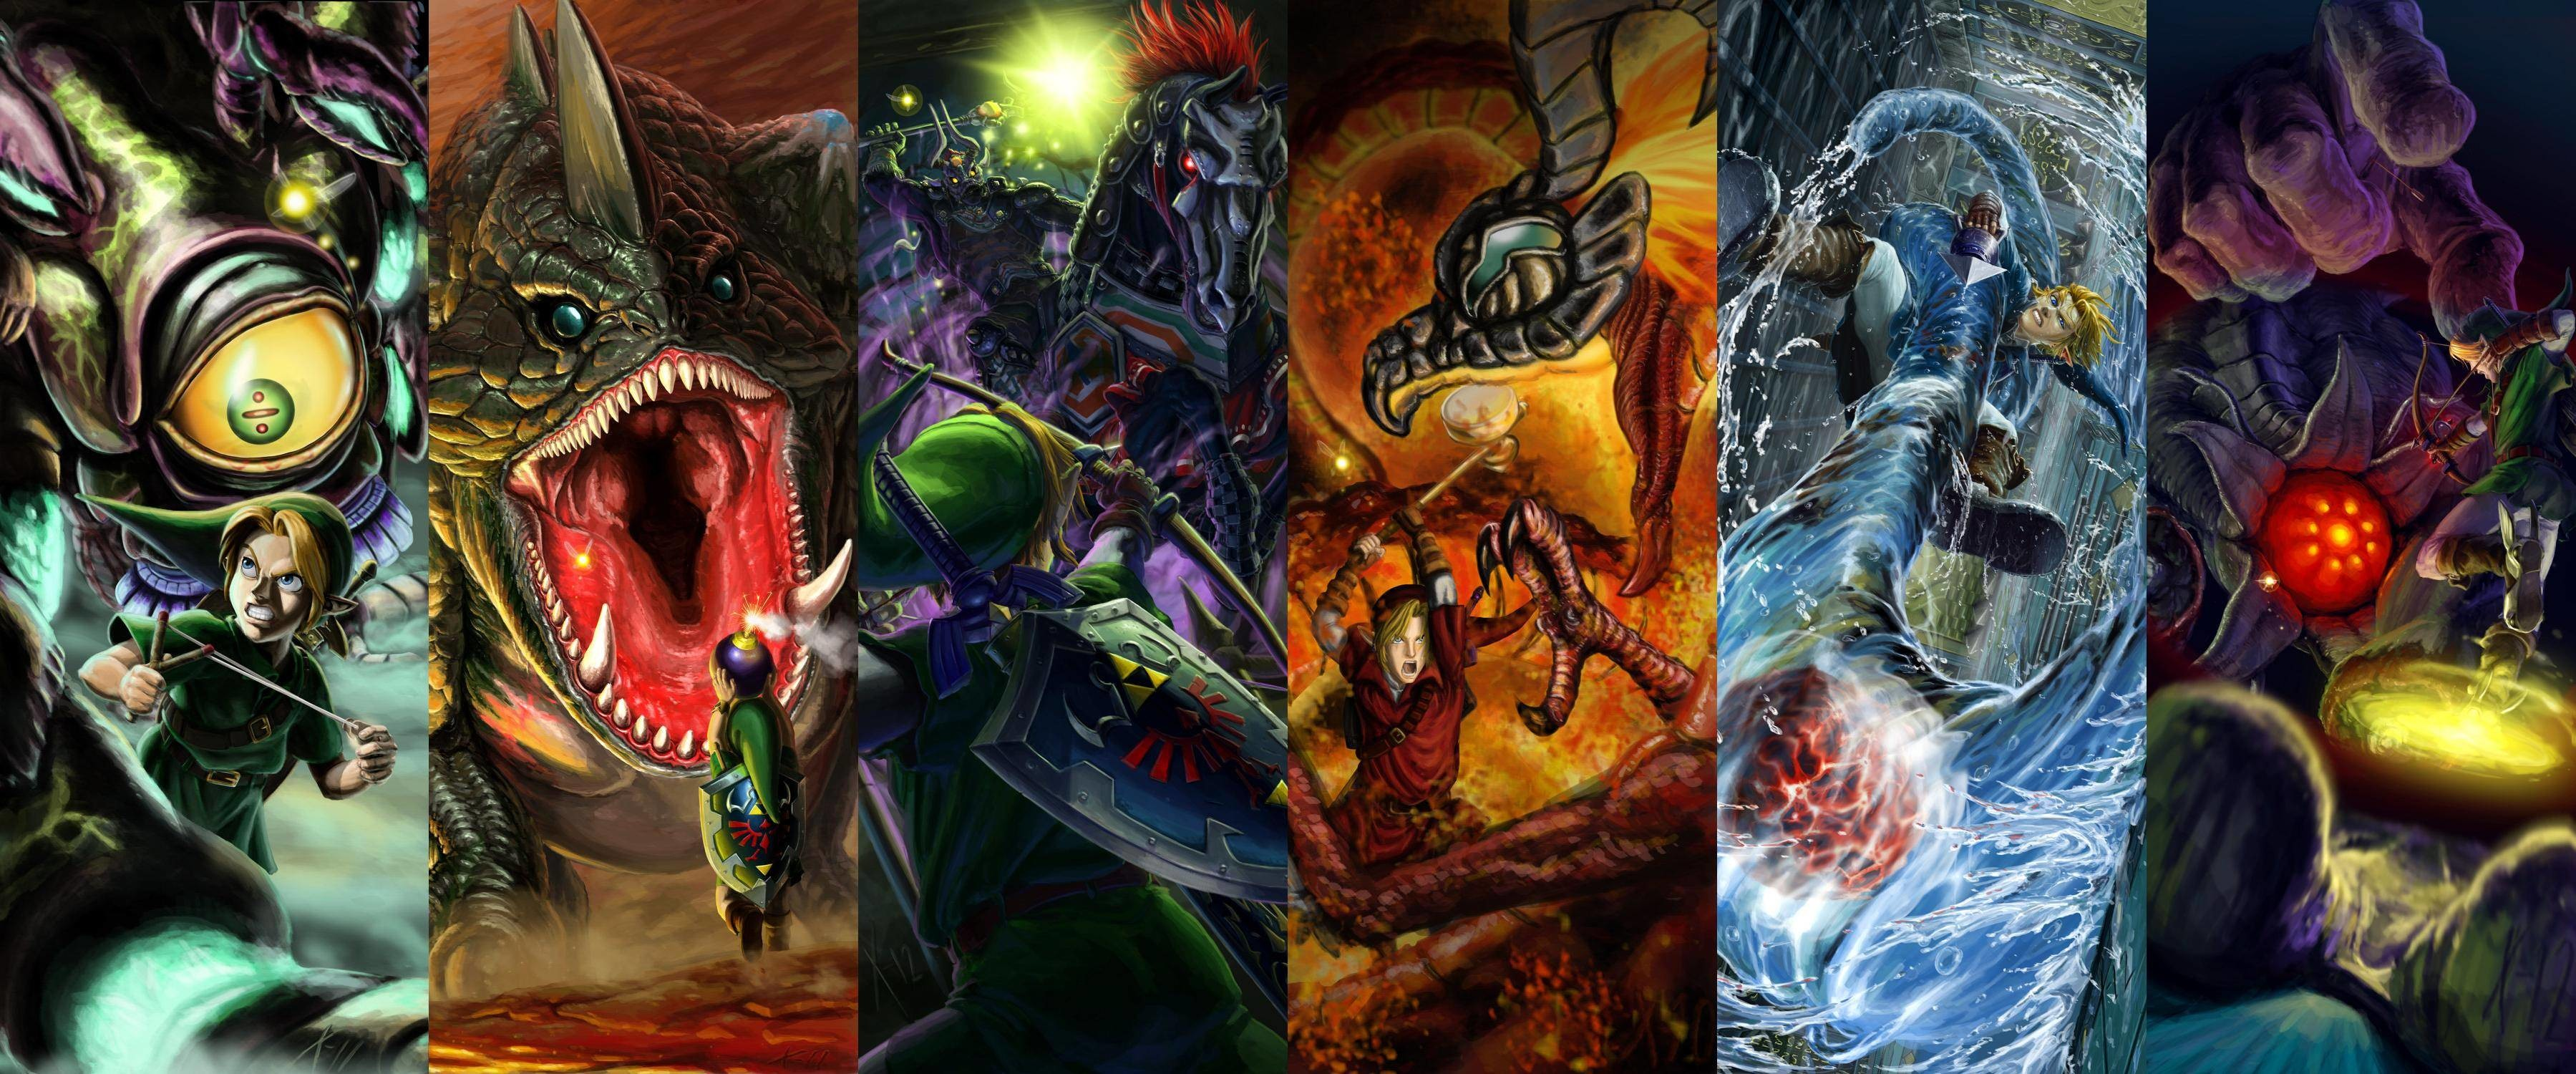 Ocarina of Time boss battles (Gohma, Dodongo, Phantom Ganon, Volvagia,  Morpha, & Bongo Bongo) wallpaper …